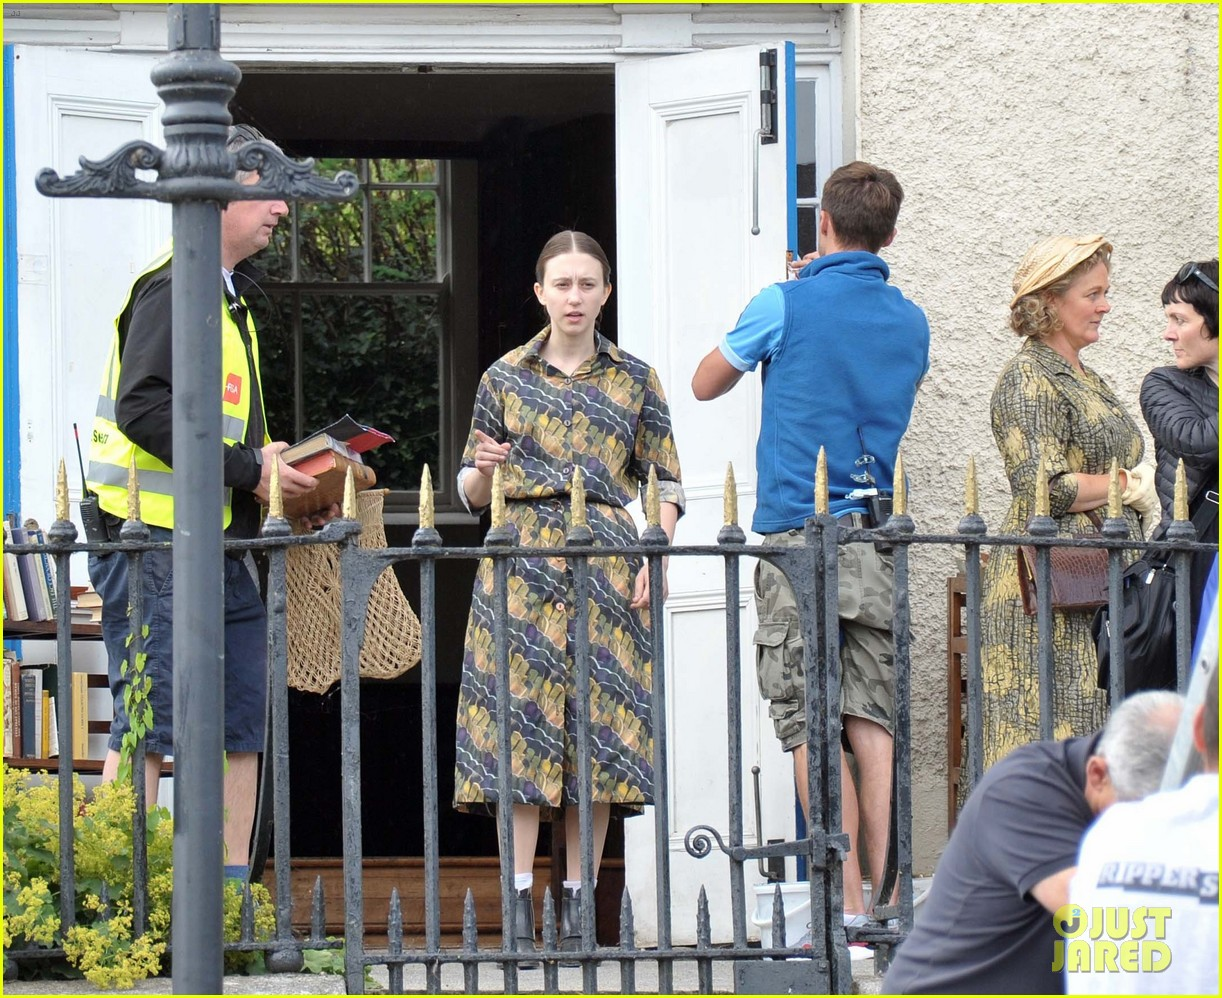 sebastian stan taissa farmiga filming movie ireland 16